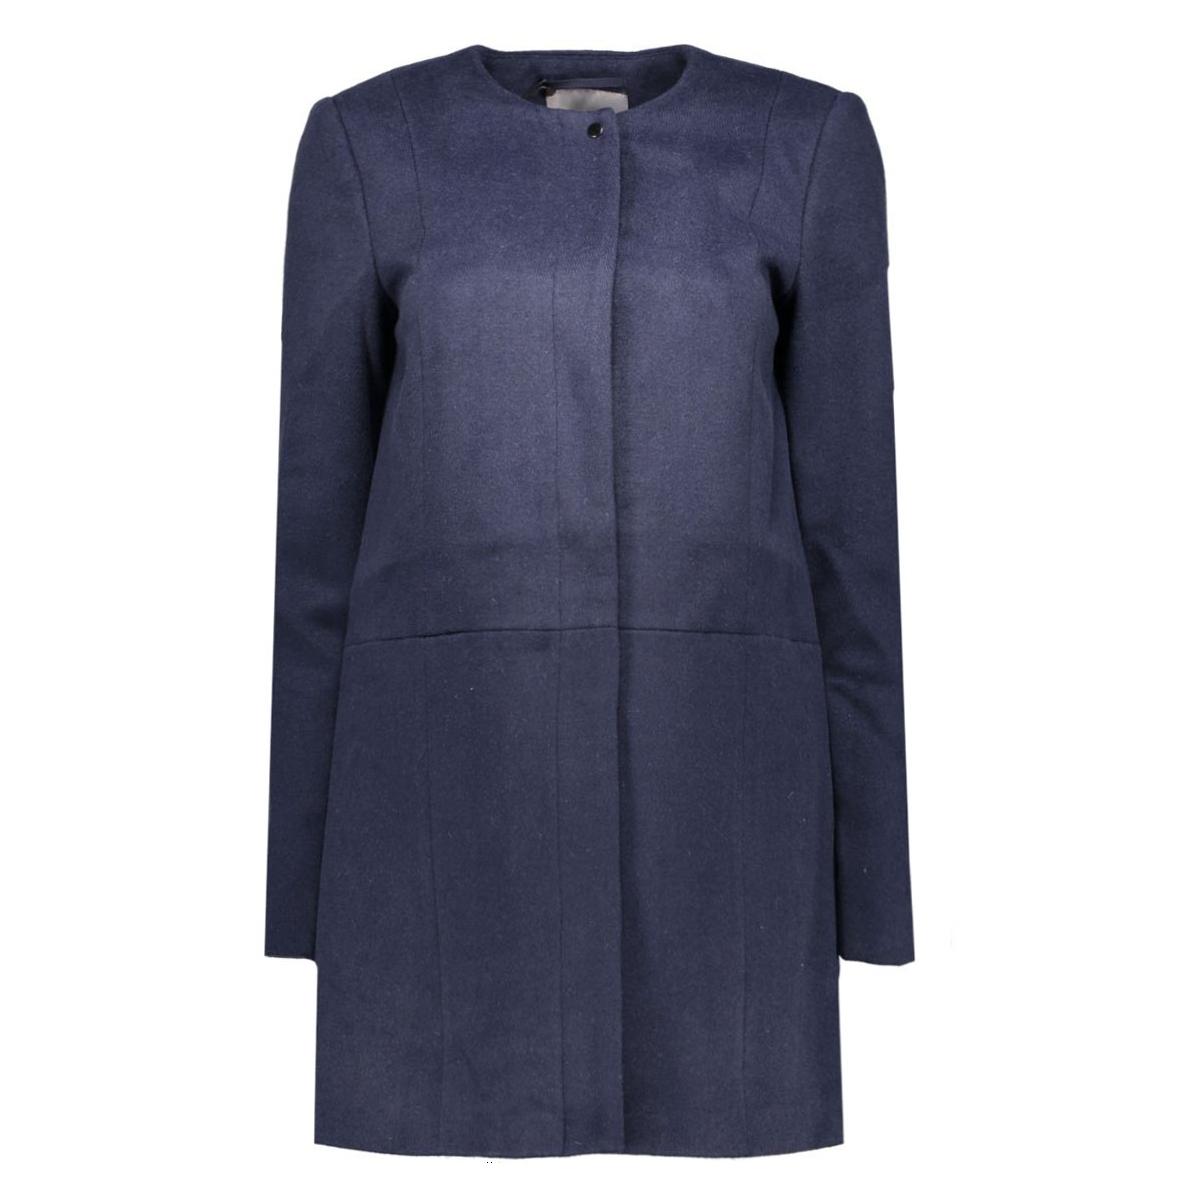 vmanke rich 3/4 wool jacket a 10159255 vero moda jas navy blazer